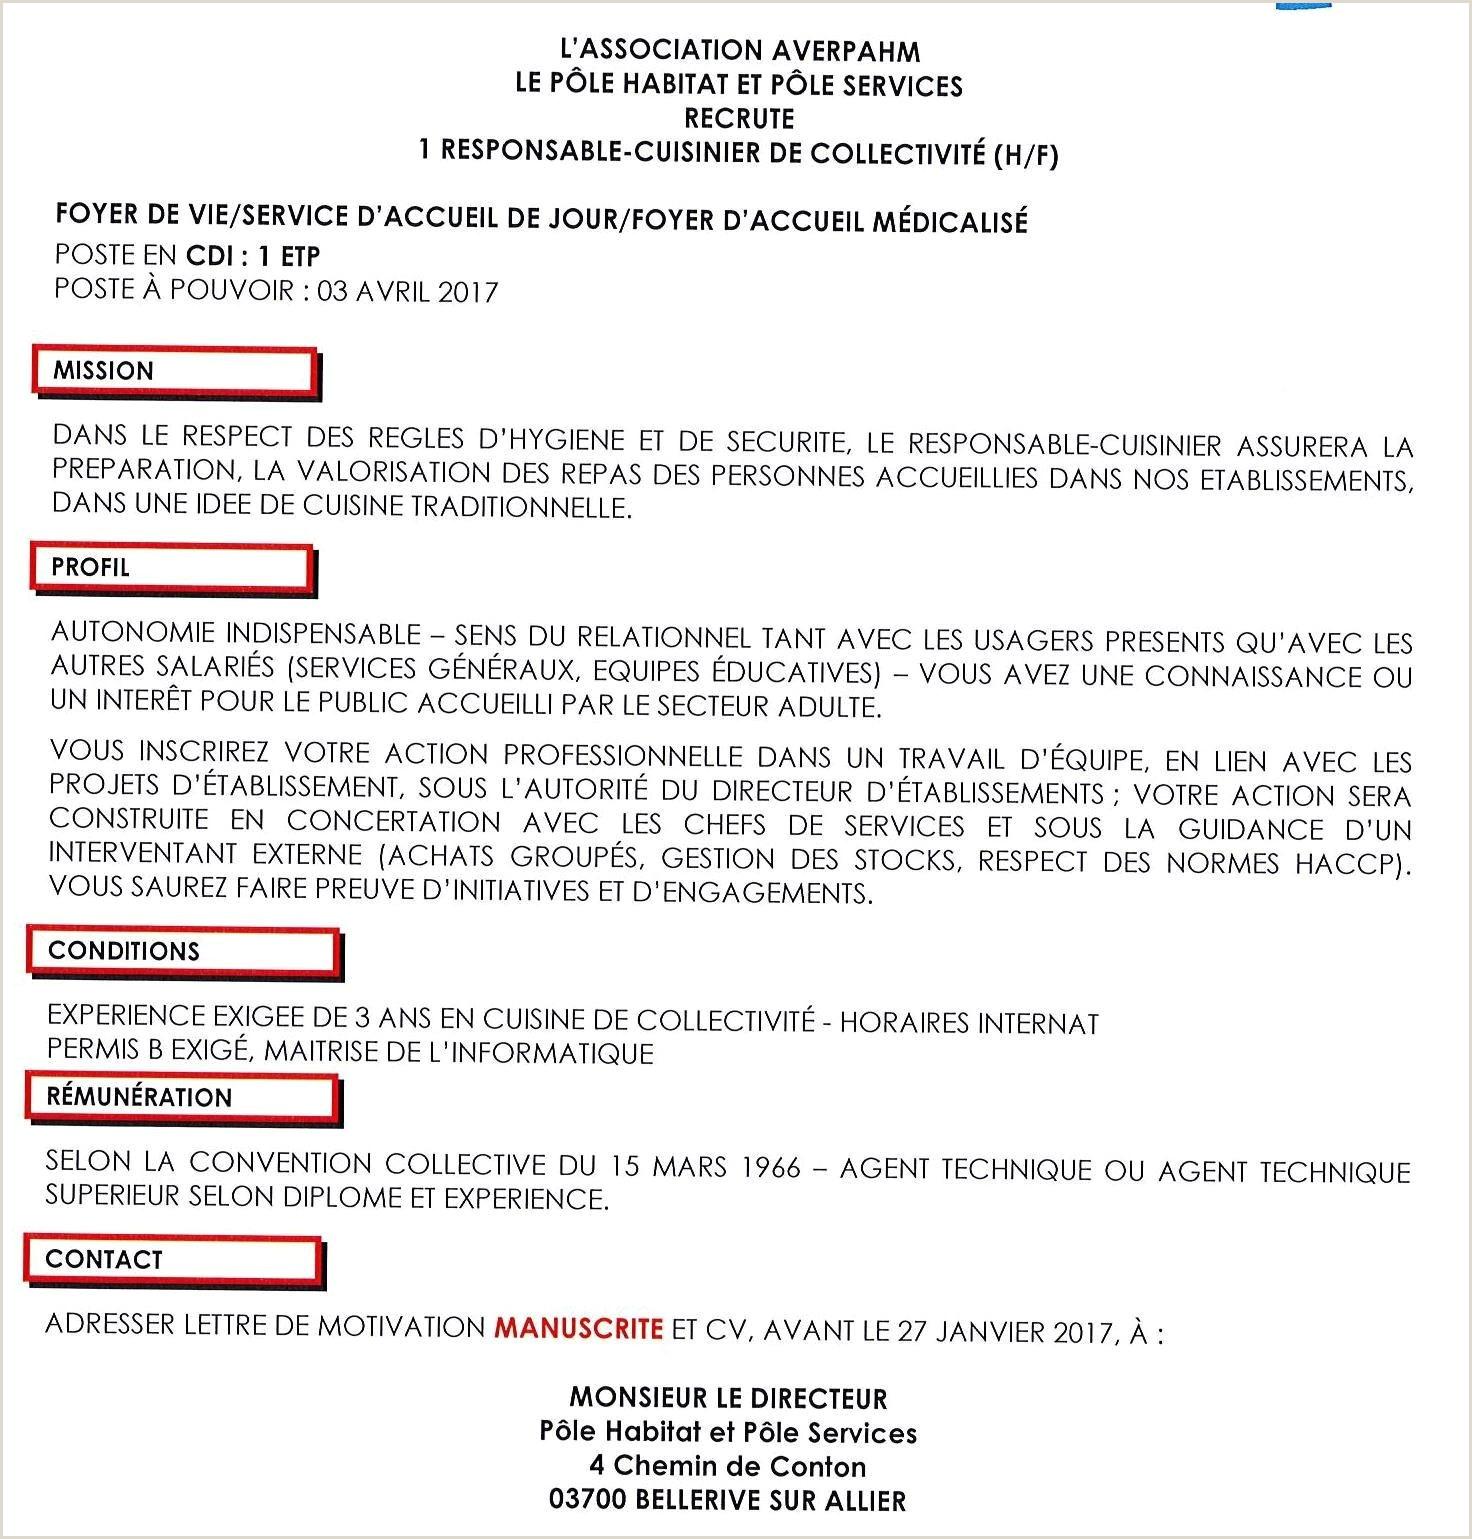 Lebenslauf Muster Coiffeuse association formation Coiffure Modele Cv Stage Meilleur De